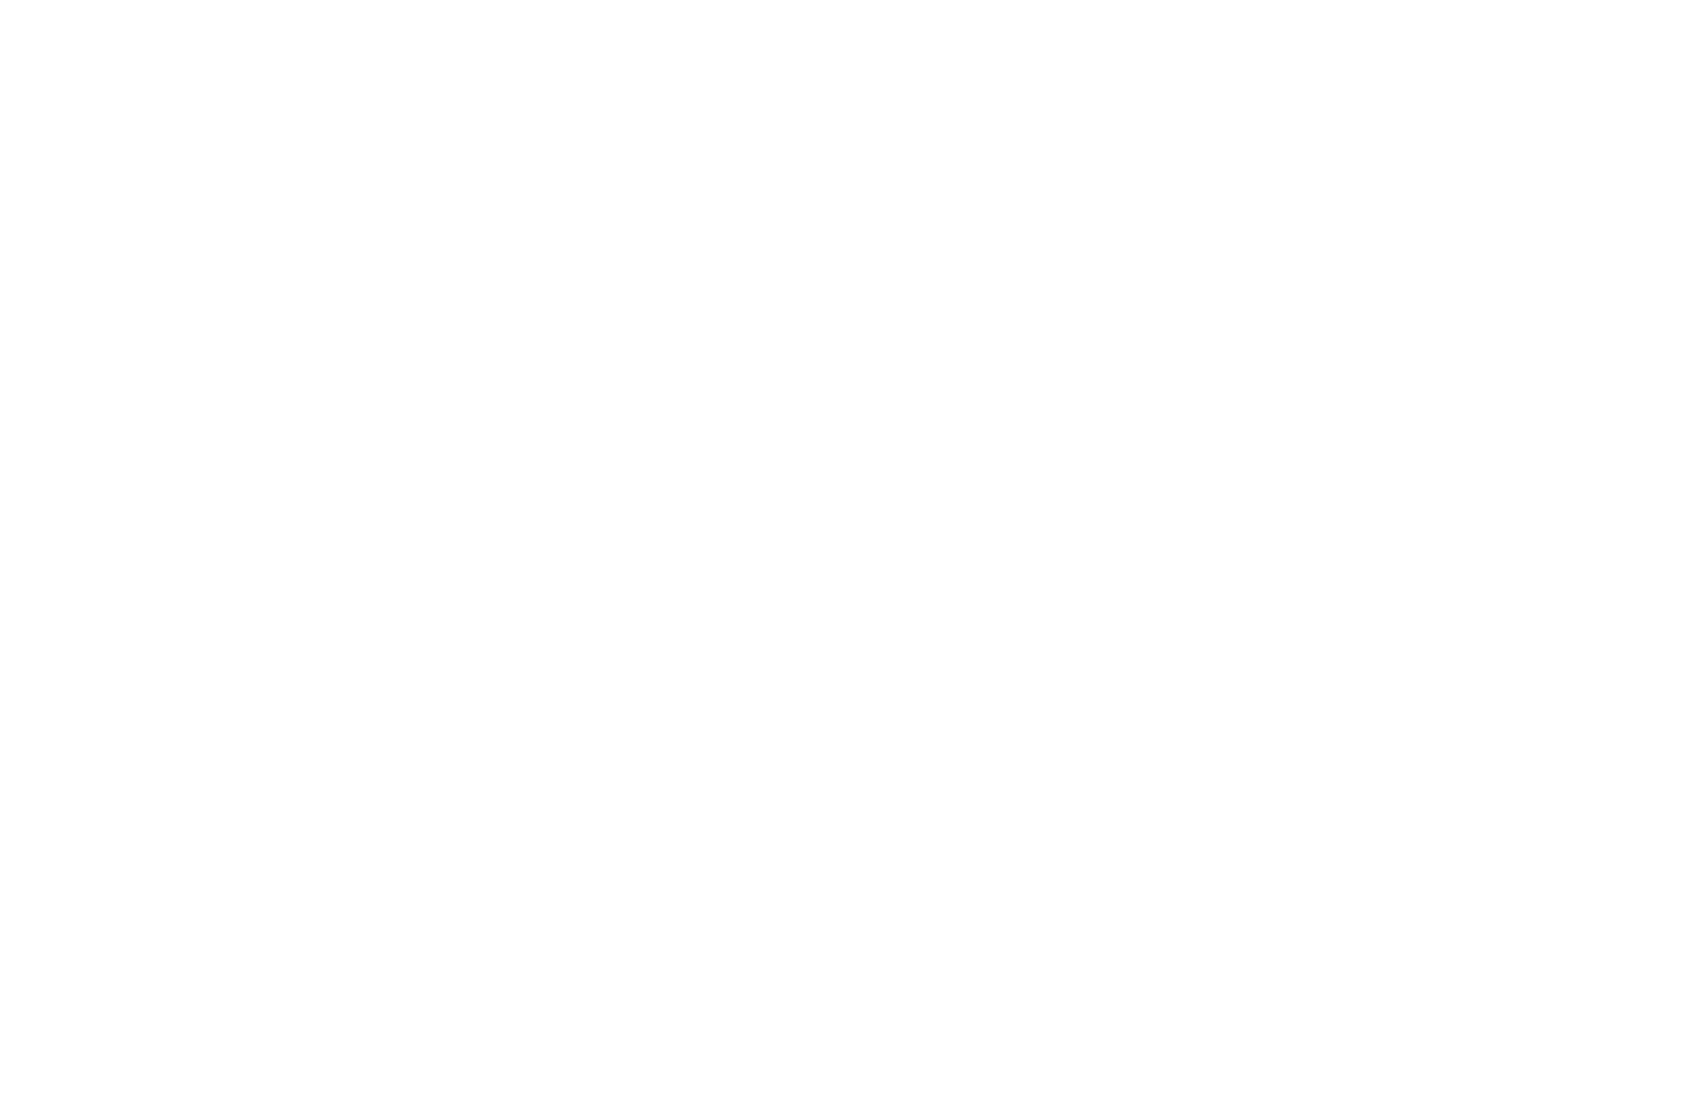 Bruno Vassari - Soós Ágnes kozmetikus